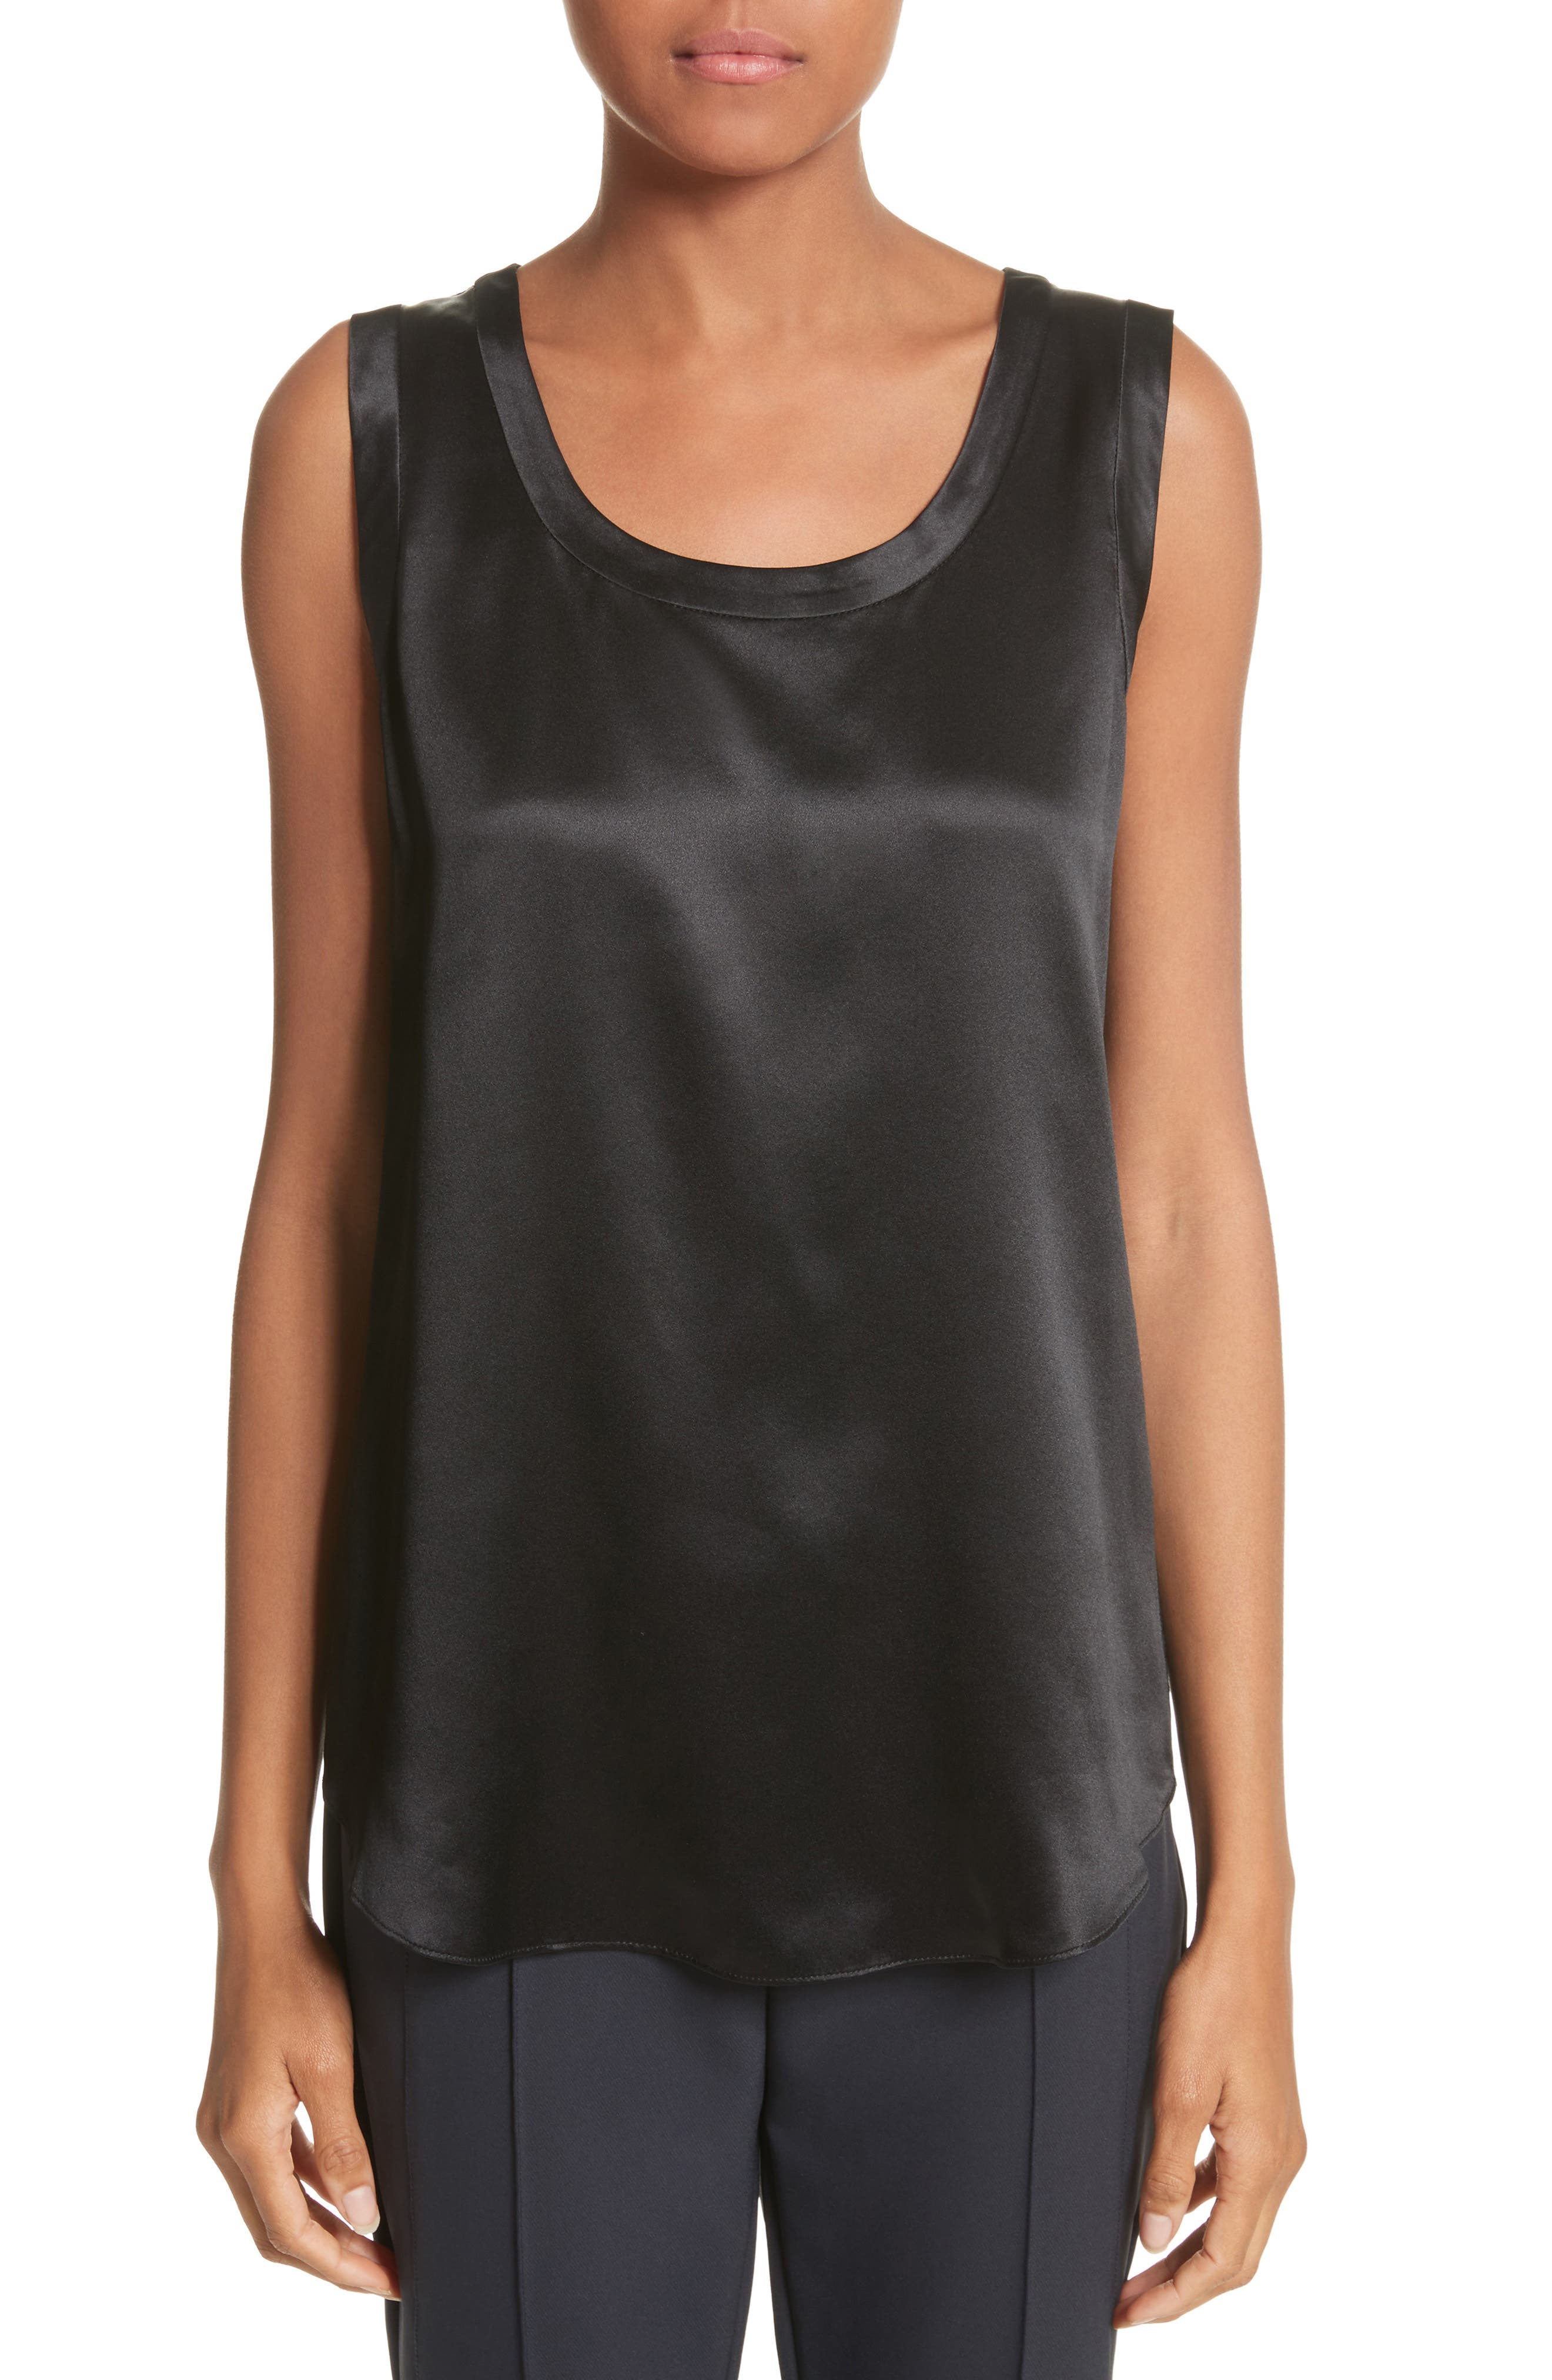 LAFAYETTE 148 NEW YORK, Perla Reversible Silk Blouse, Main thumbnail 1, color, BLACK